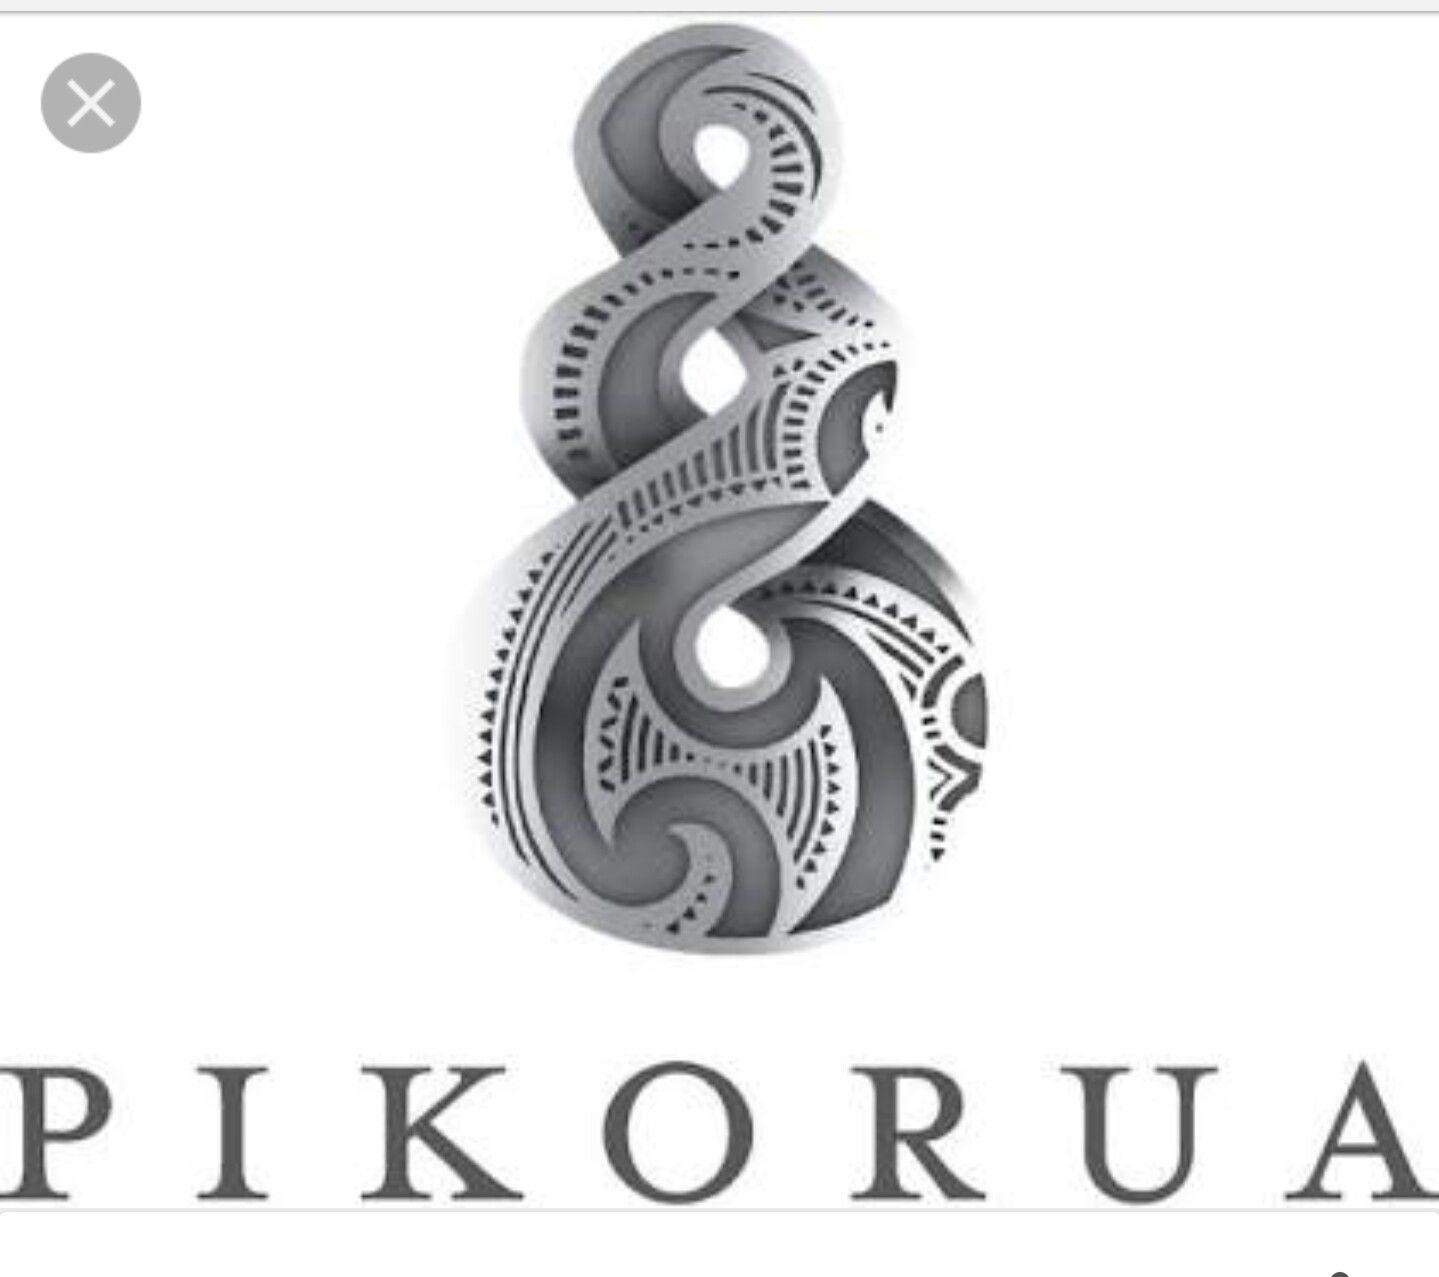 Maori Pikorua Tatmeup Pinterest Maori Maori Symbols And